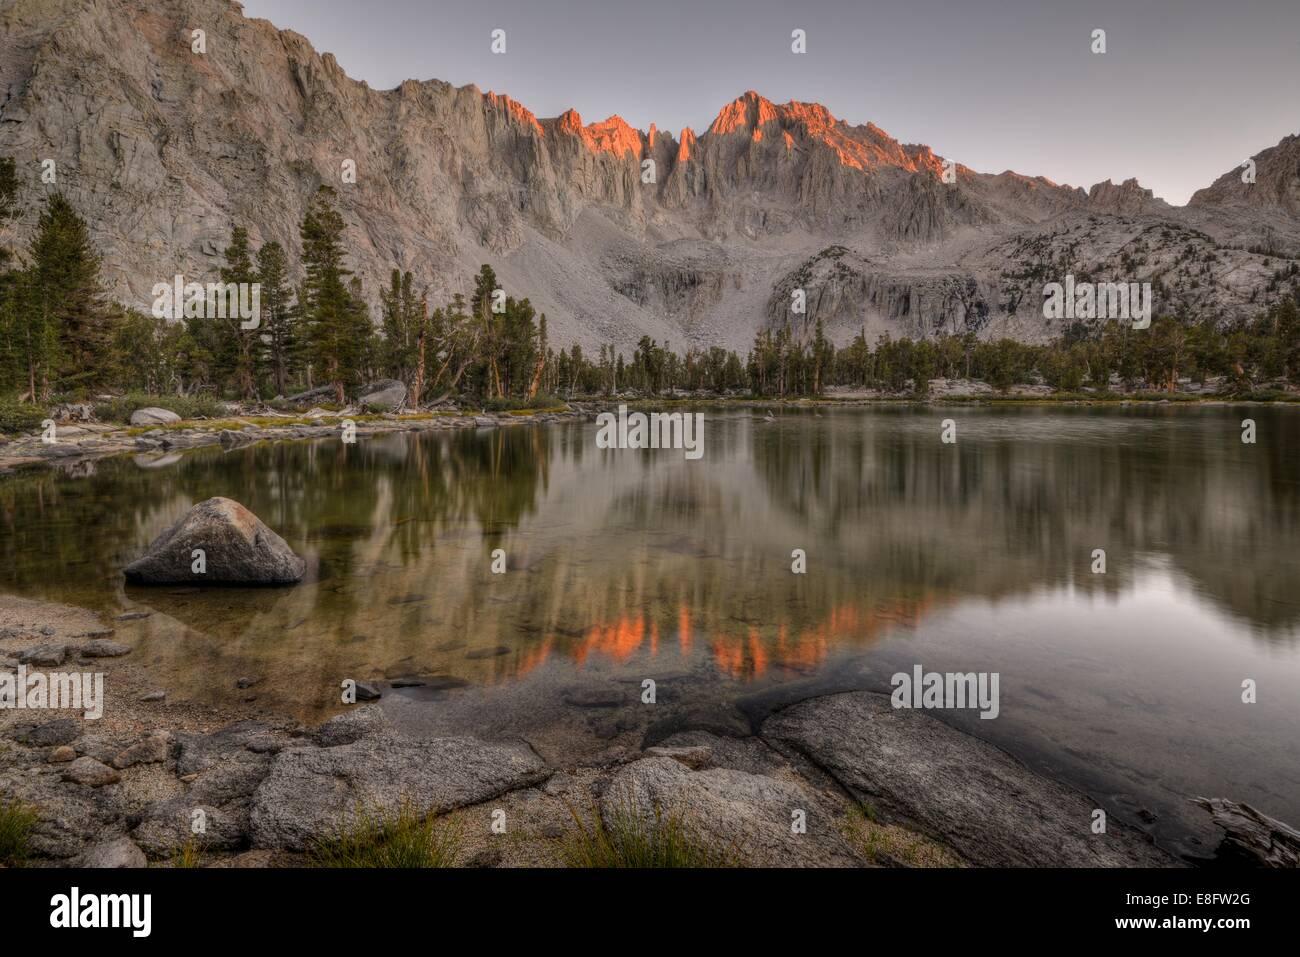 USA, California, Kings Canyon National Park, Matlock Lake and University Peak - Stock Image